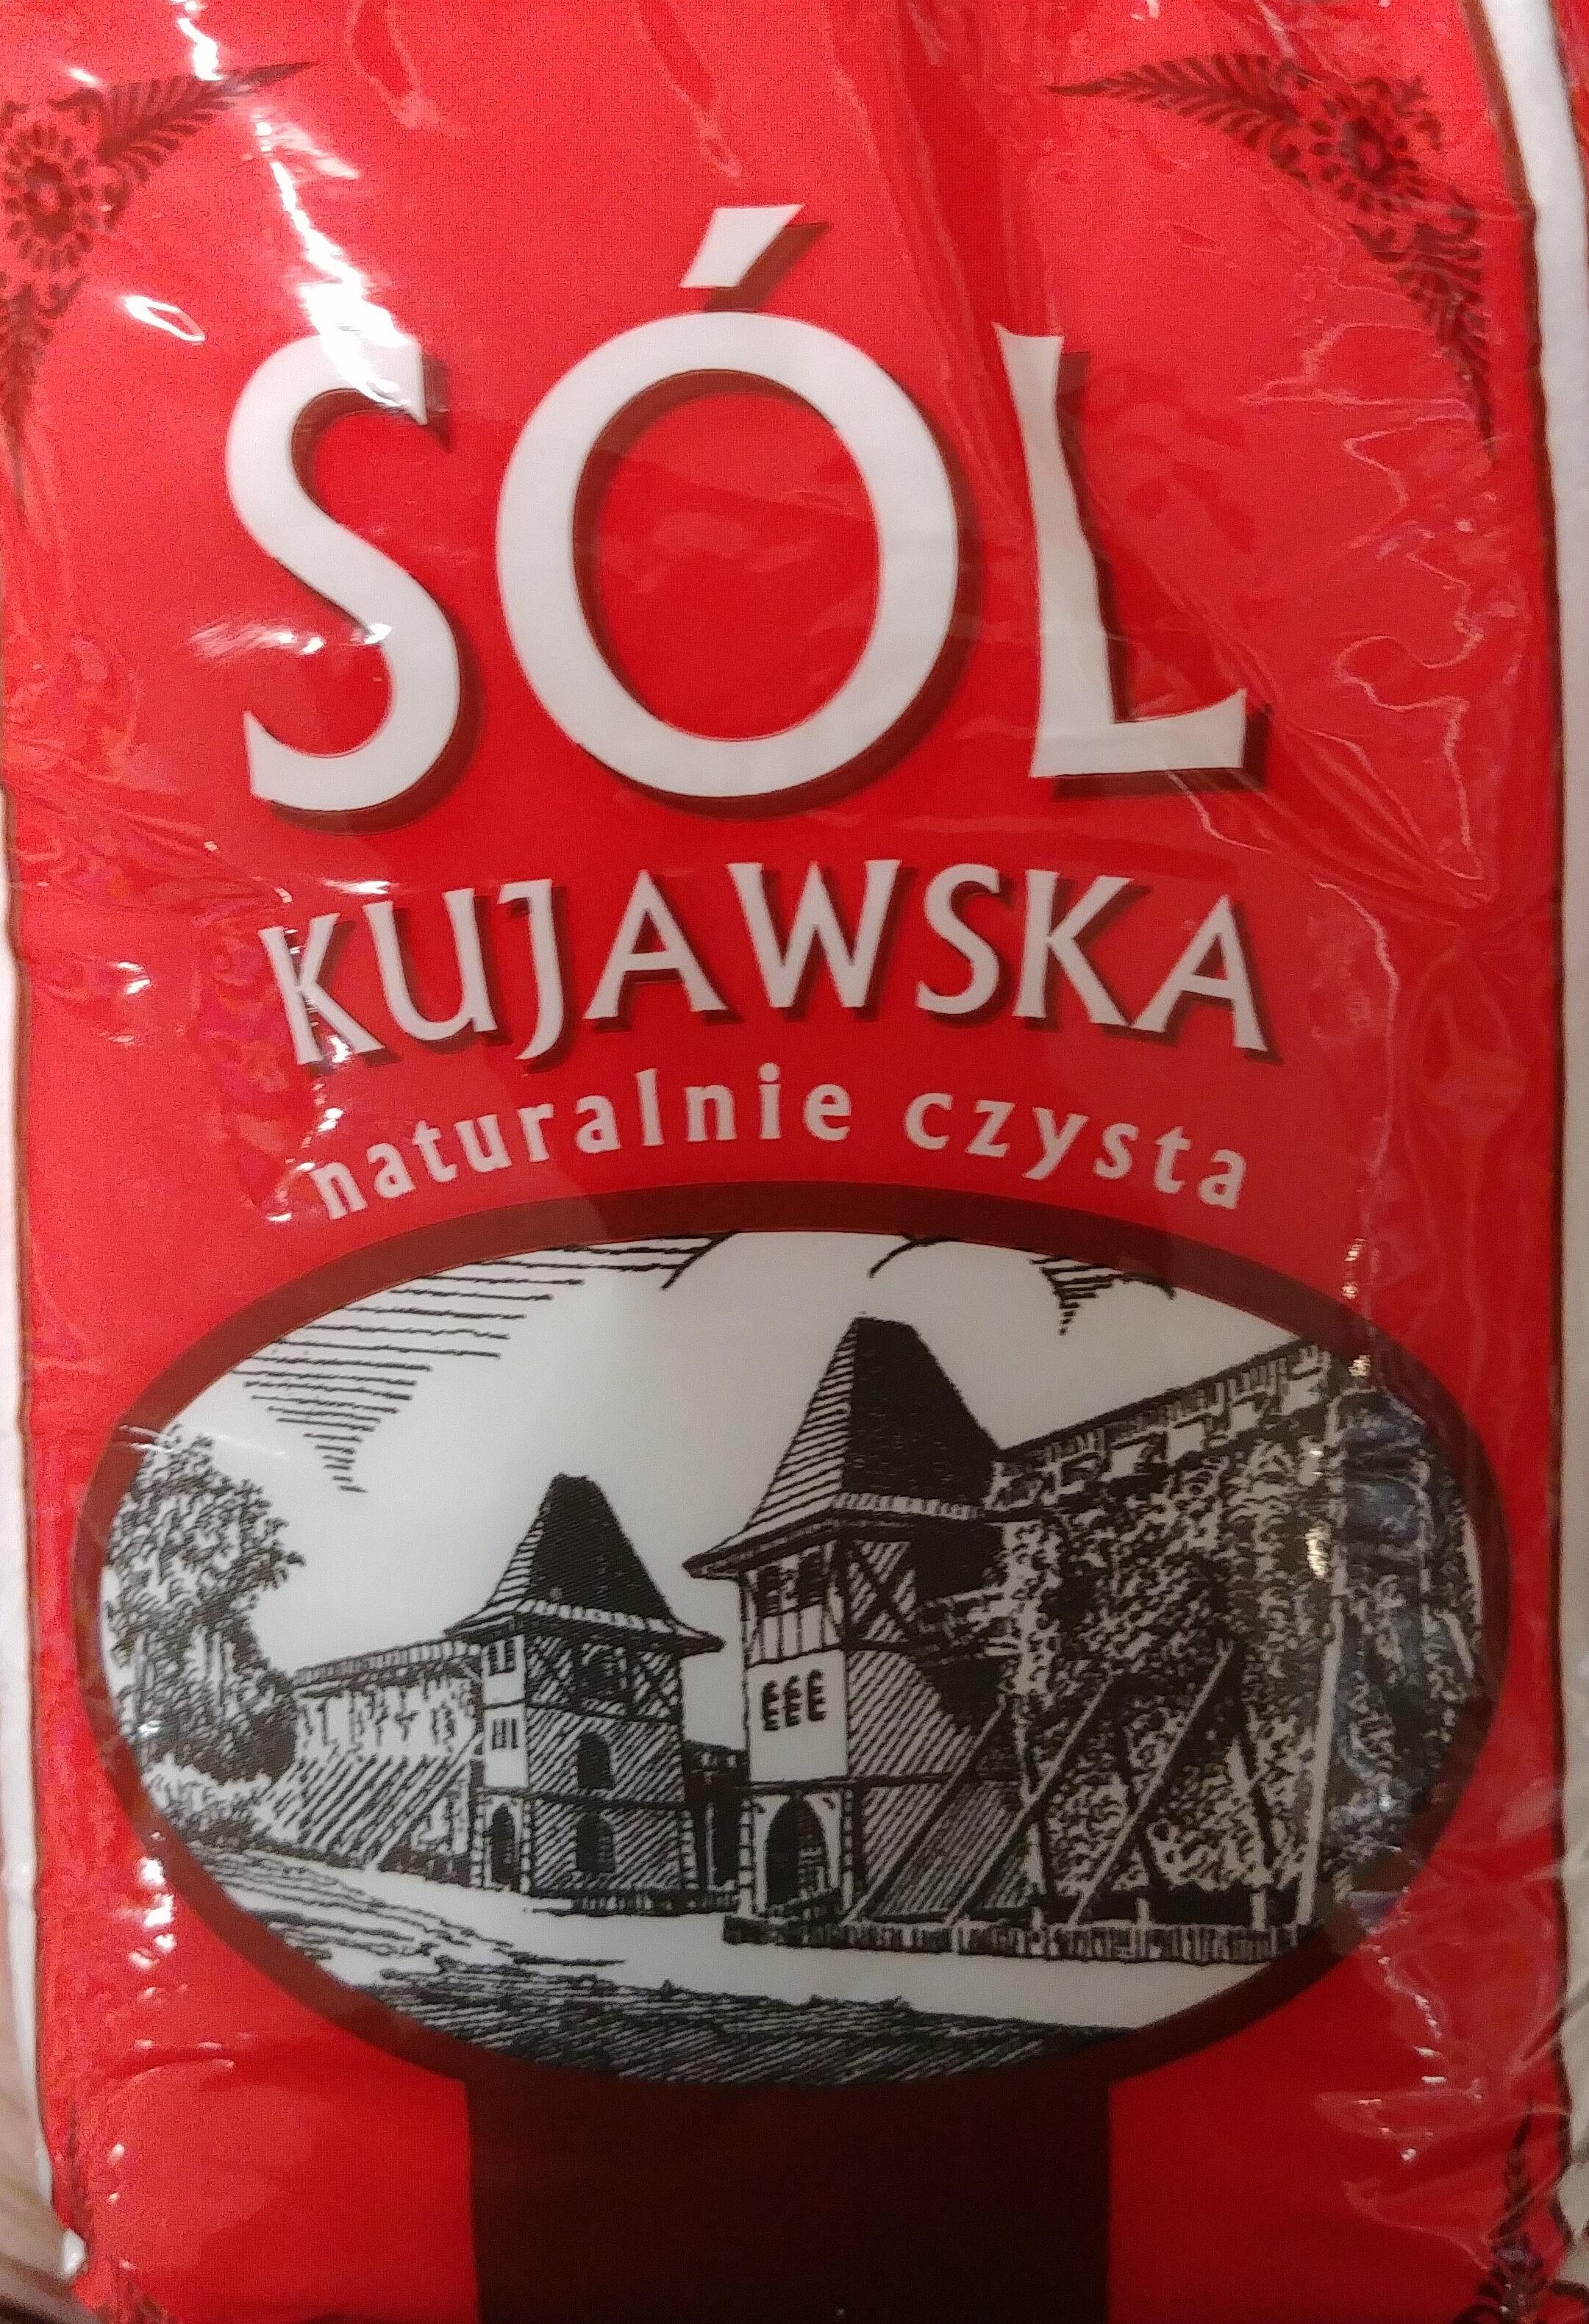 Sól Kujawska - Produkt - pl